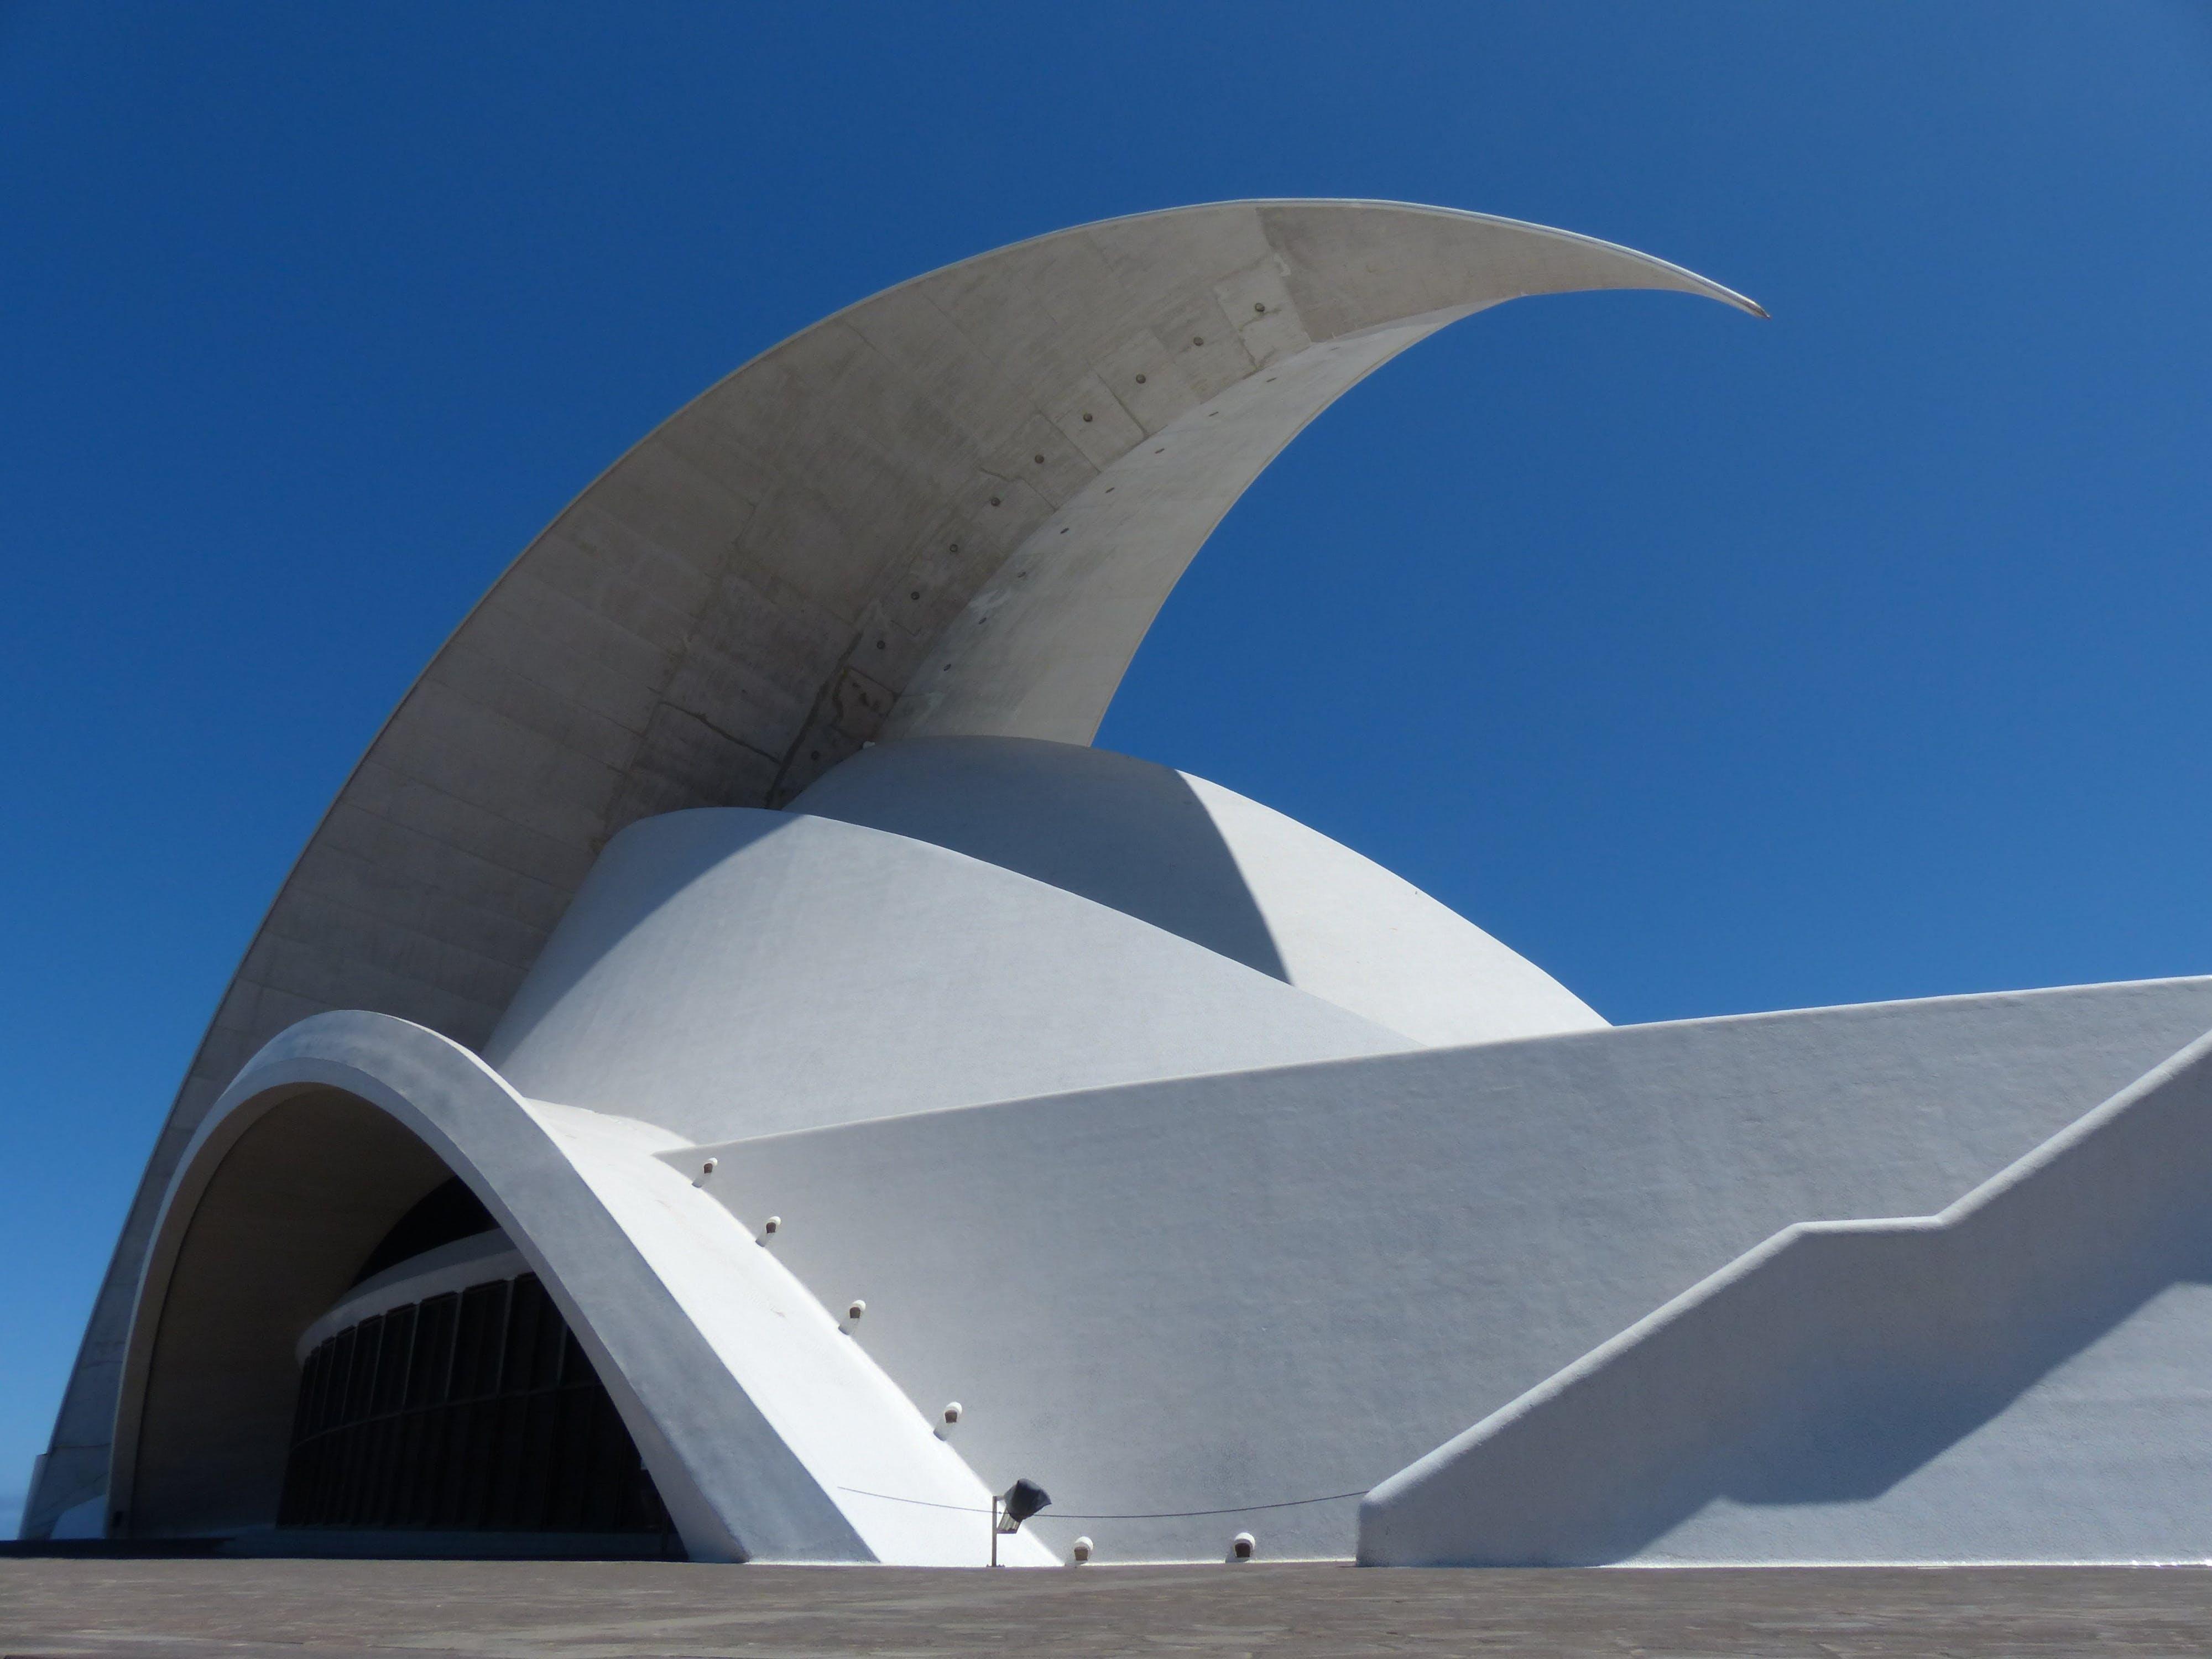 Free stock photo of architecture, auditorio de tenerife, auditorium, auditorium of tenerife